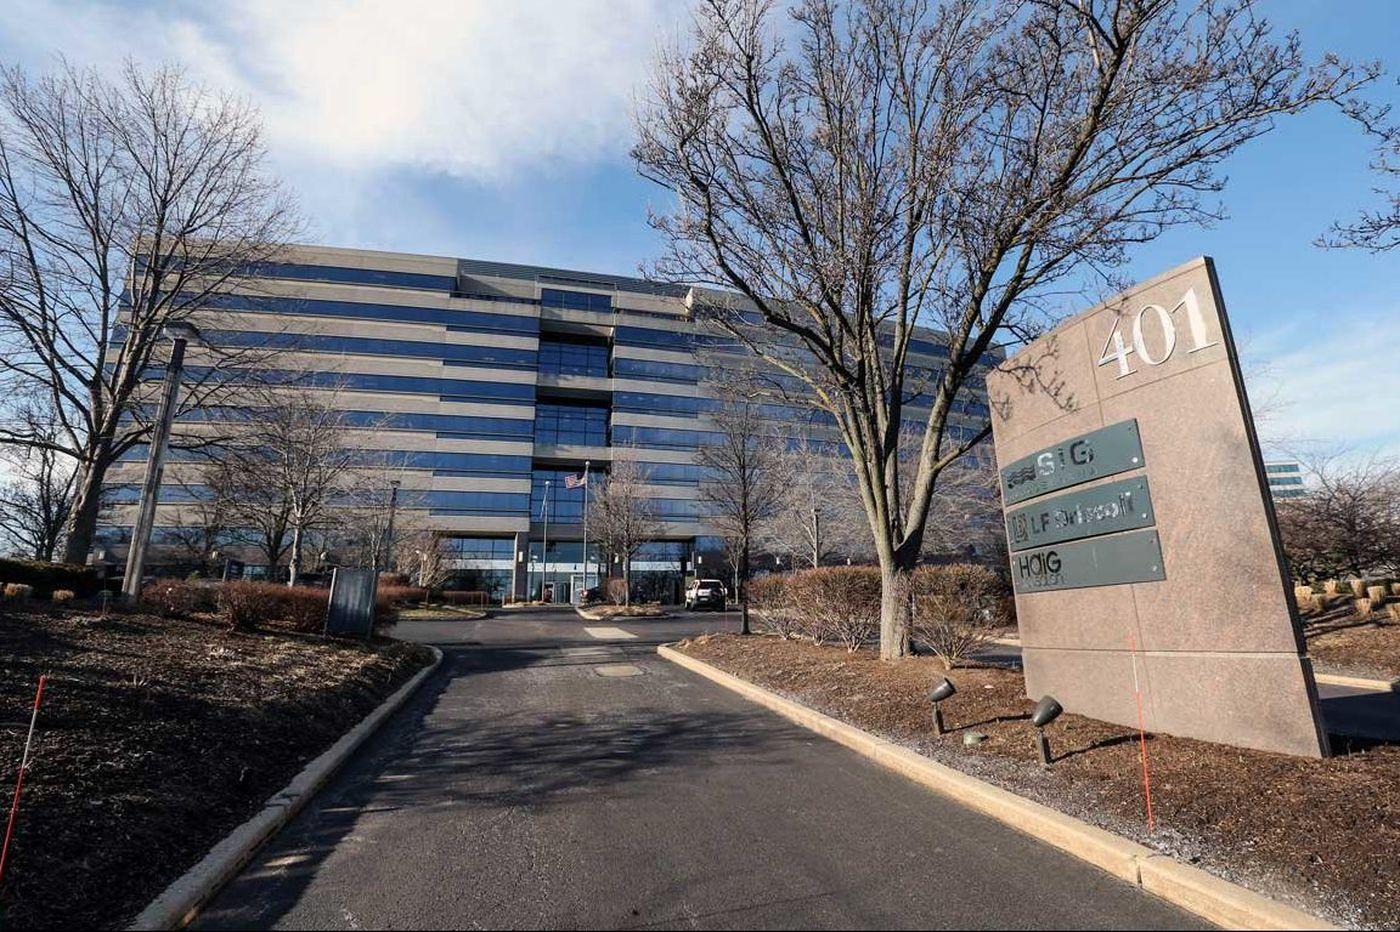 Entercom cuts dividend 78 percent as Wall St. beat up its stock